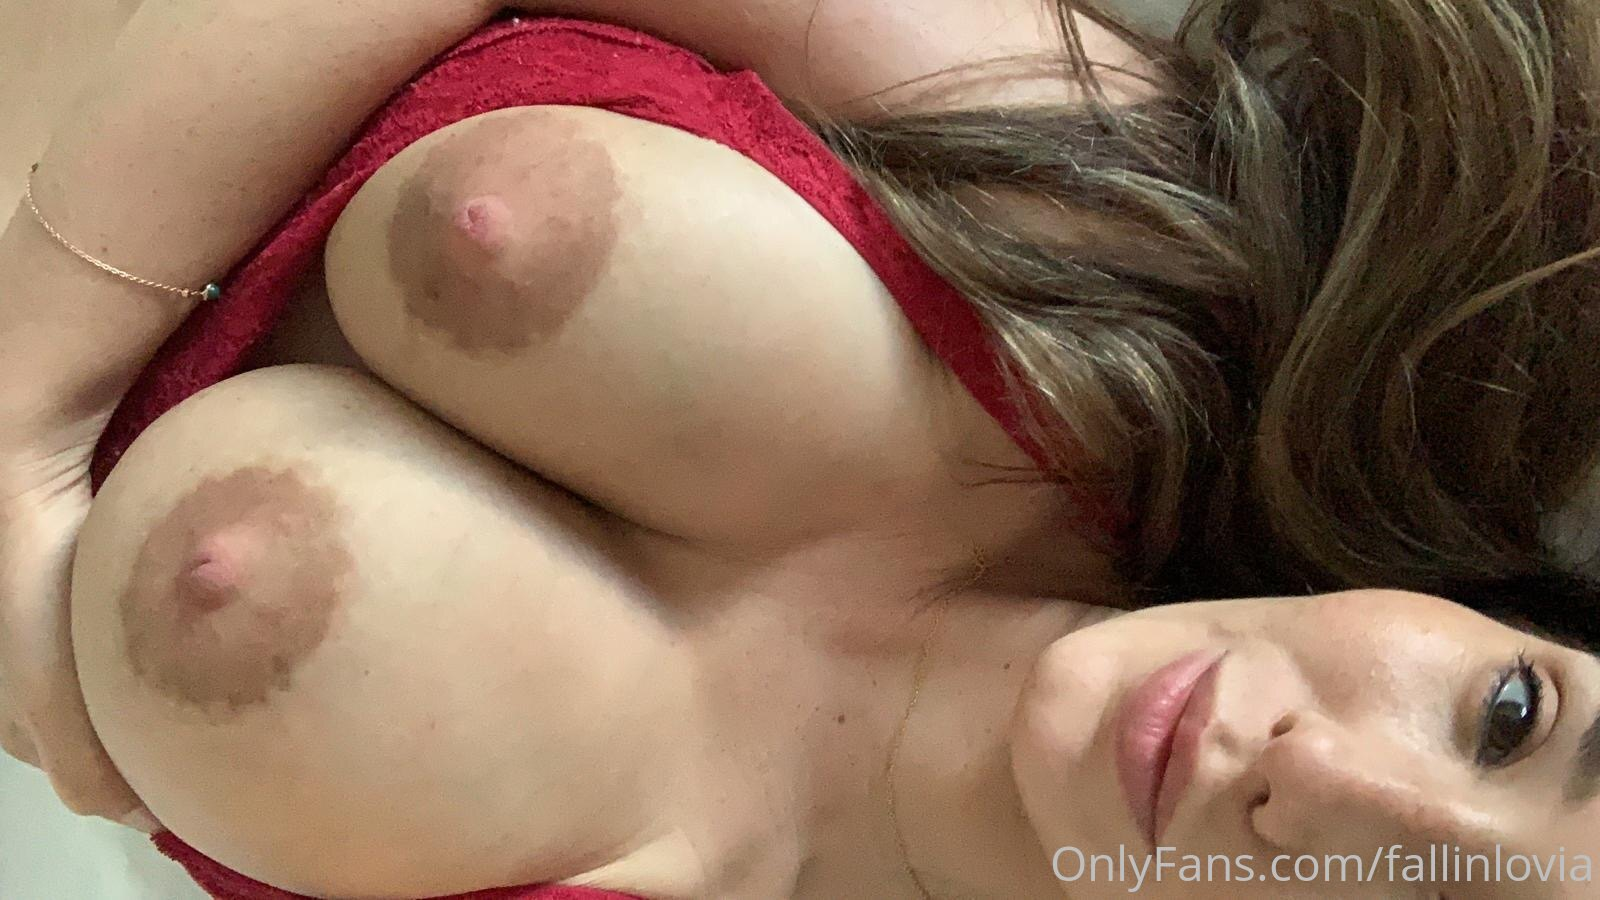 Eva Lovia, Fallinlovia, Onlyfans 0053